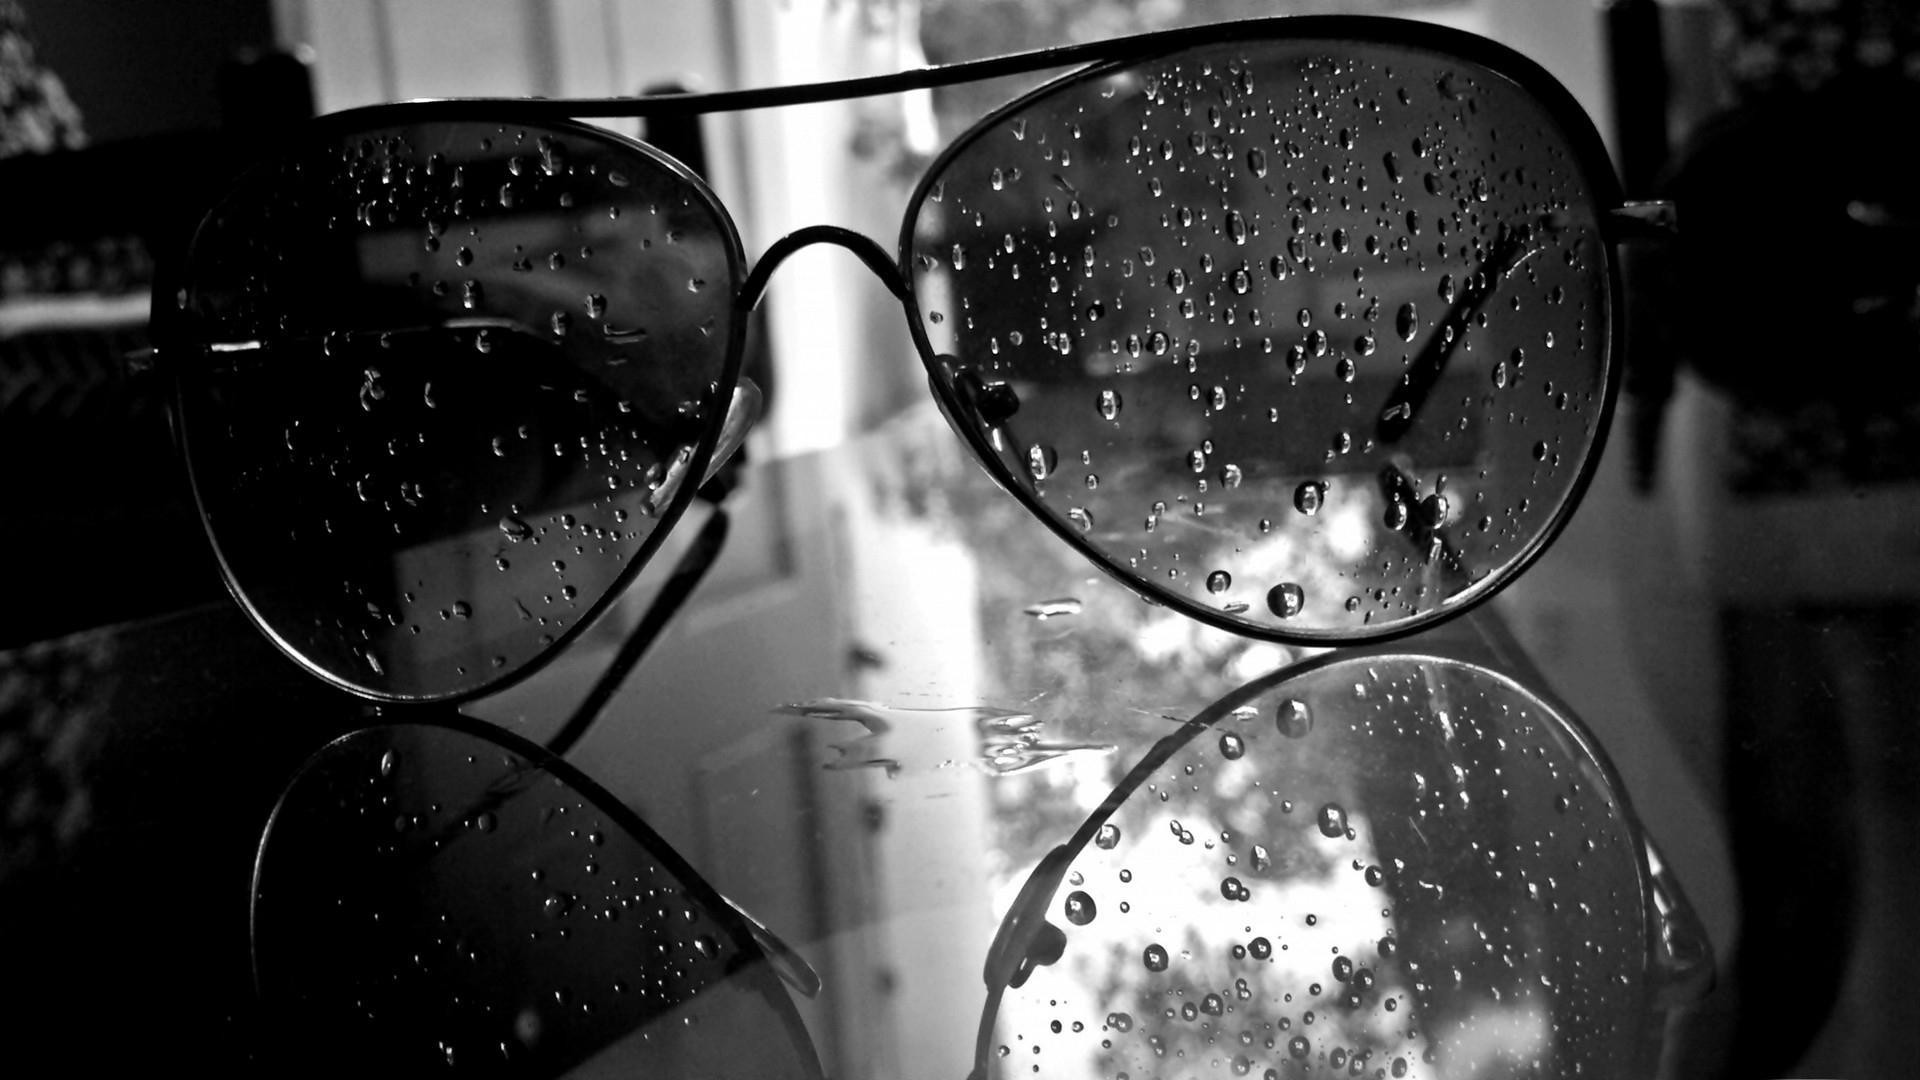 Glasses Monochrome Water Drops Aviator Black White For Desktop